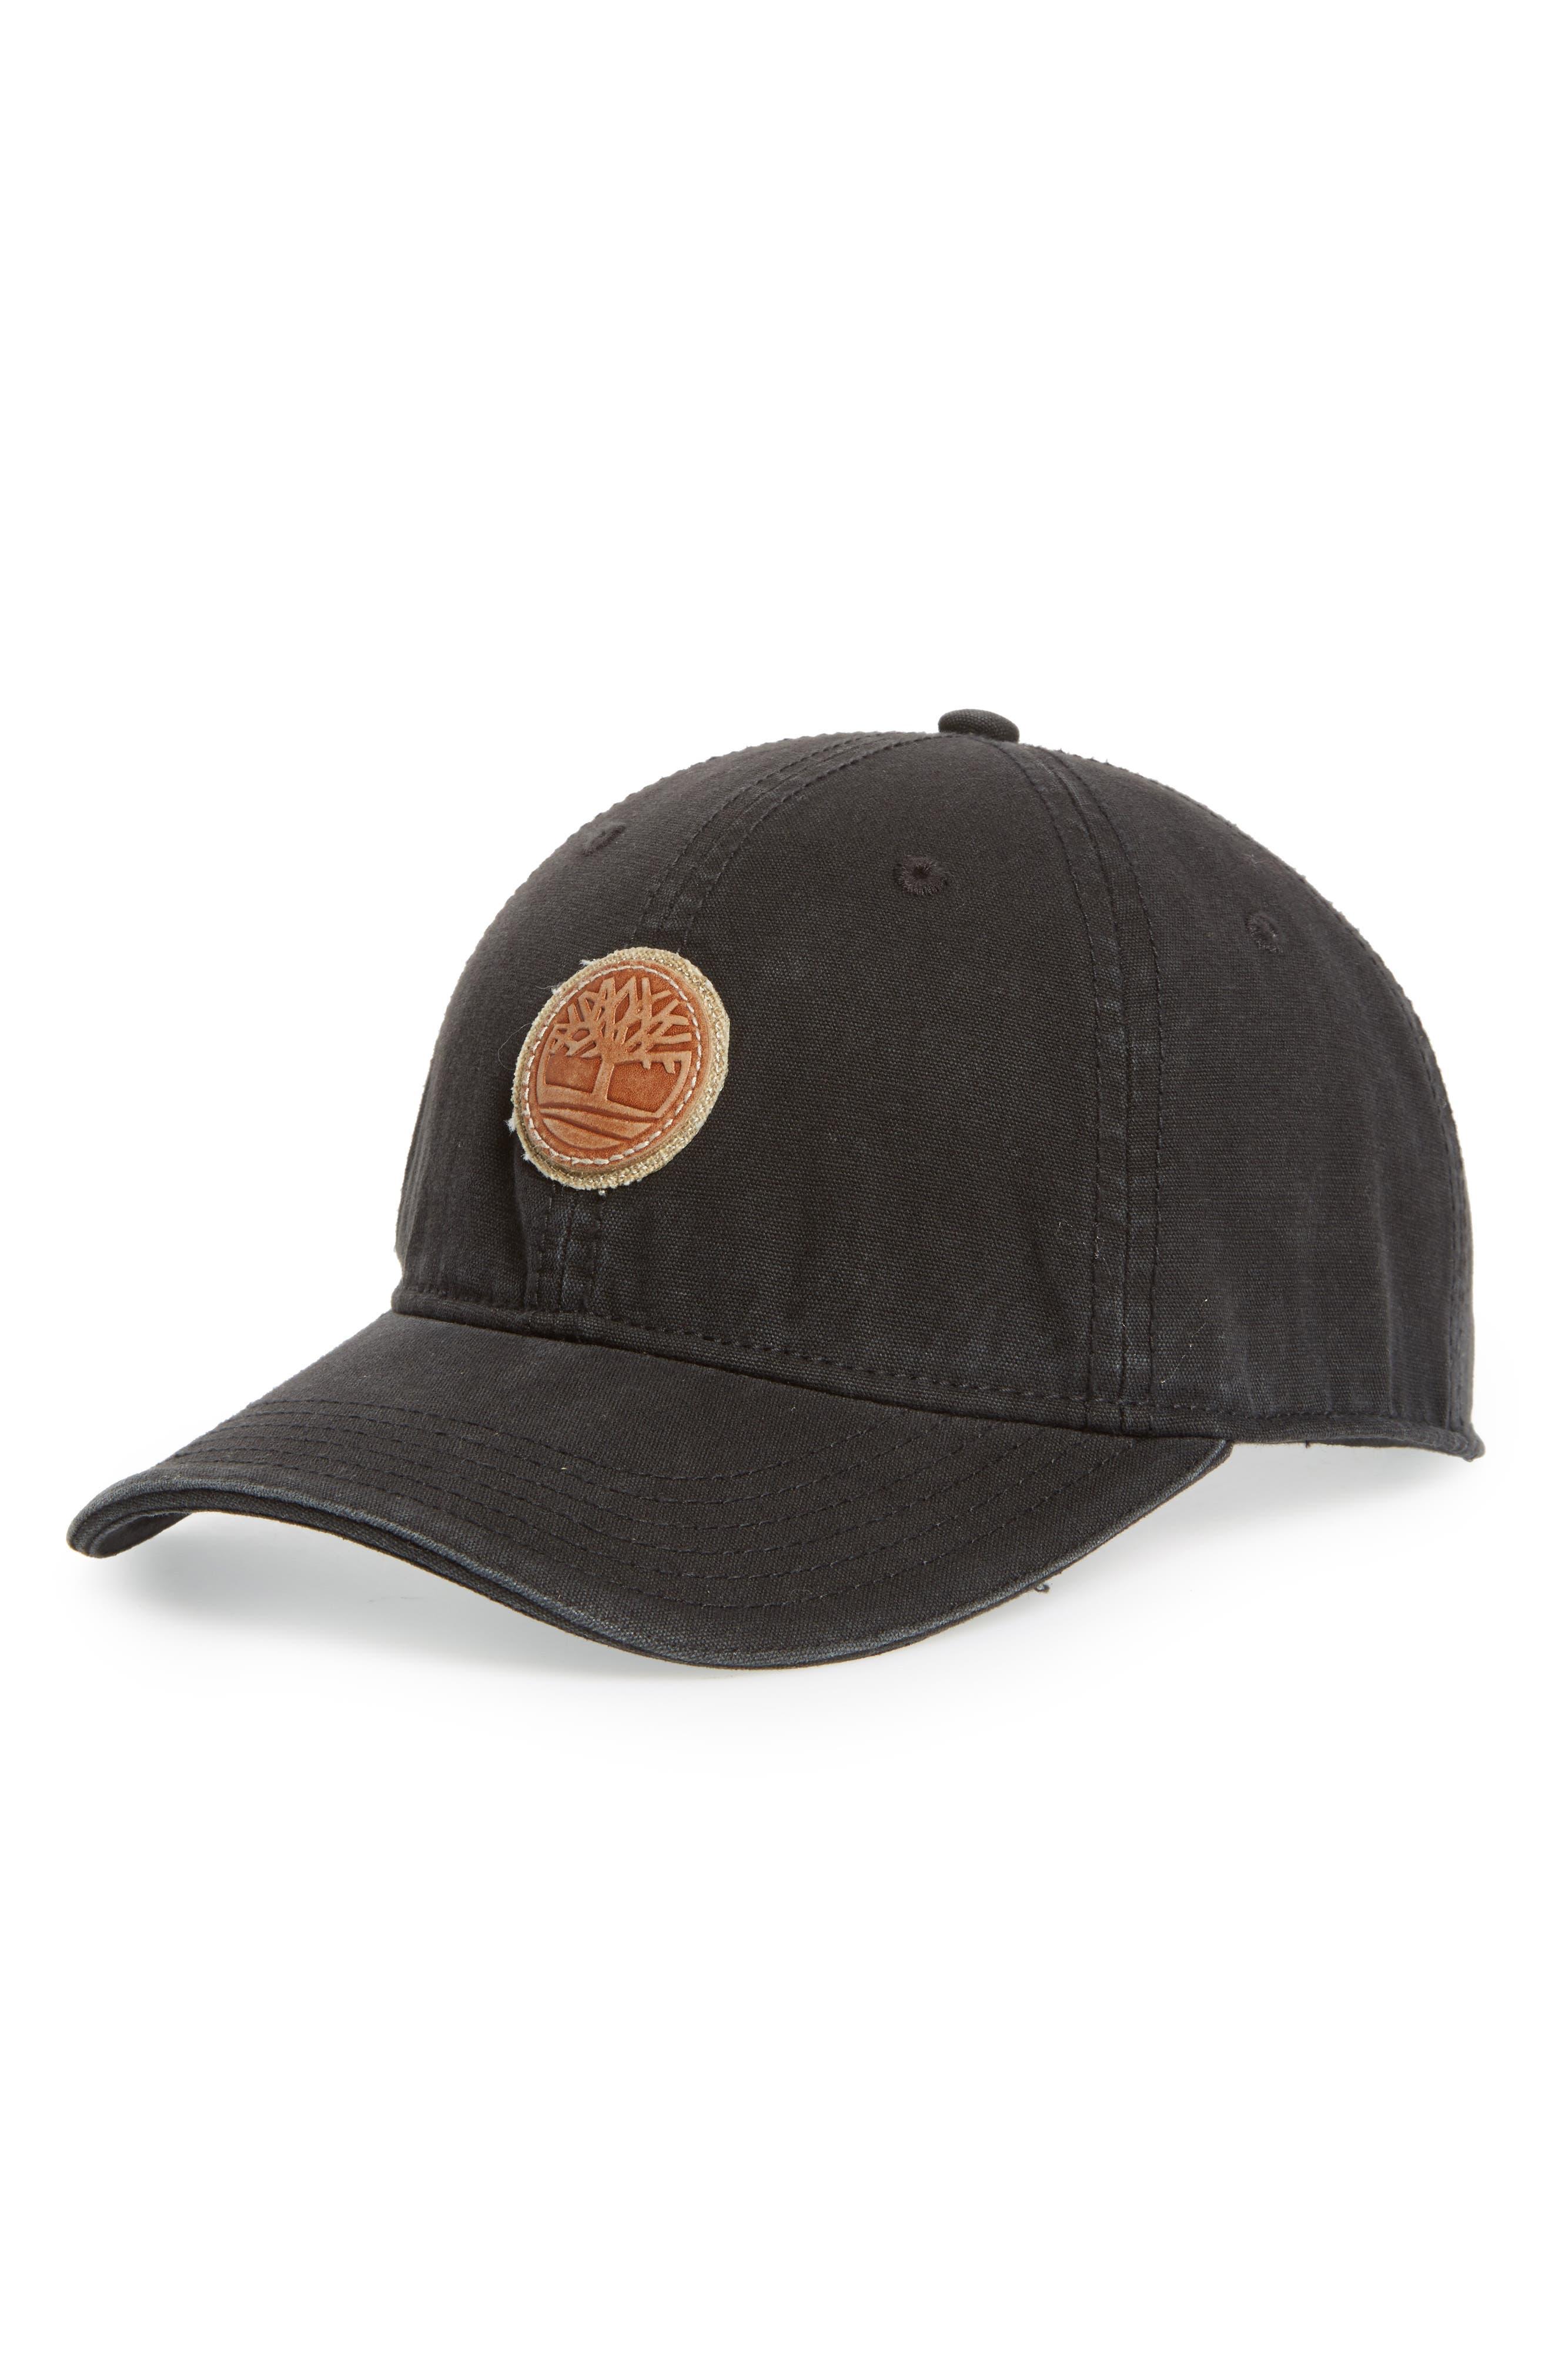 Timberland Rye Beach Logo Patch Ball Cap